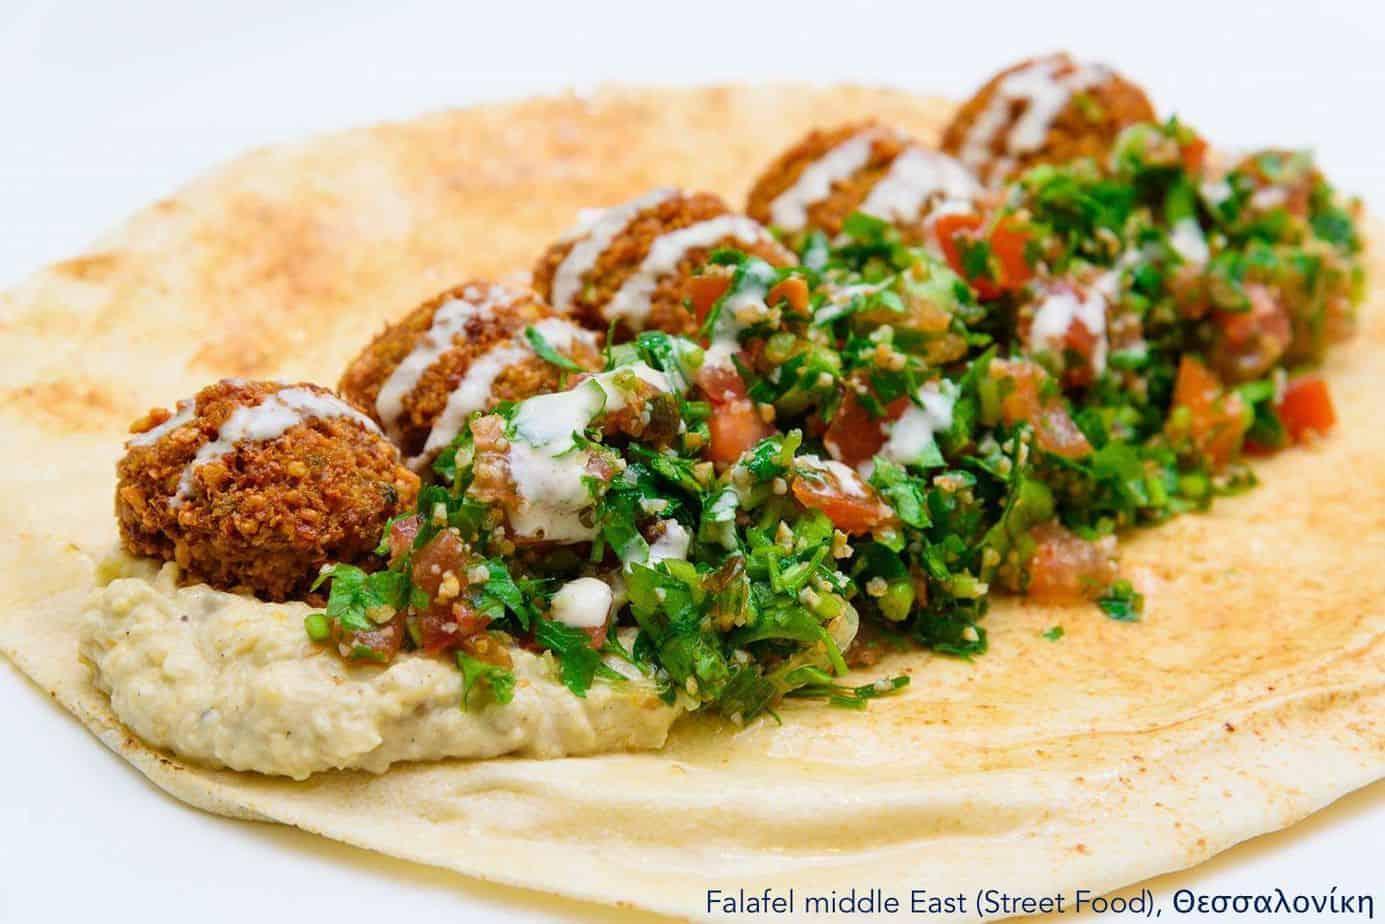 7 Vegan Delivery | Εστιατόρια, Θεσσαλονίκη Falafel middle east #veganrestaurants #greekvegan maninio.com